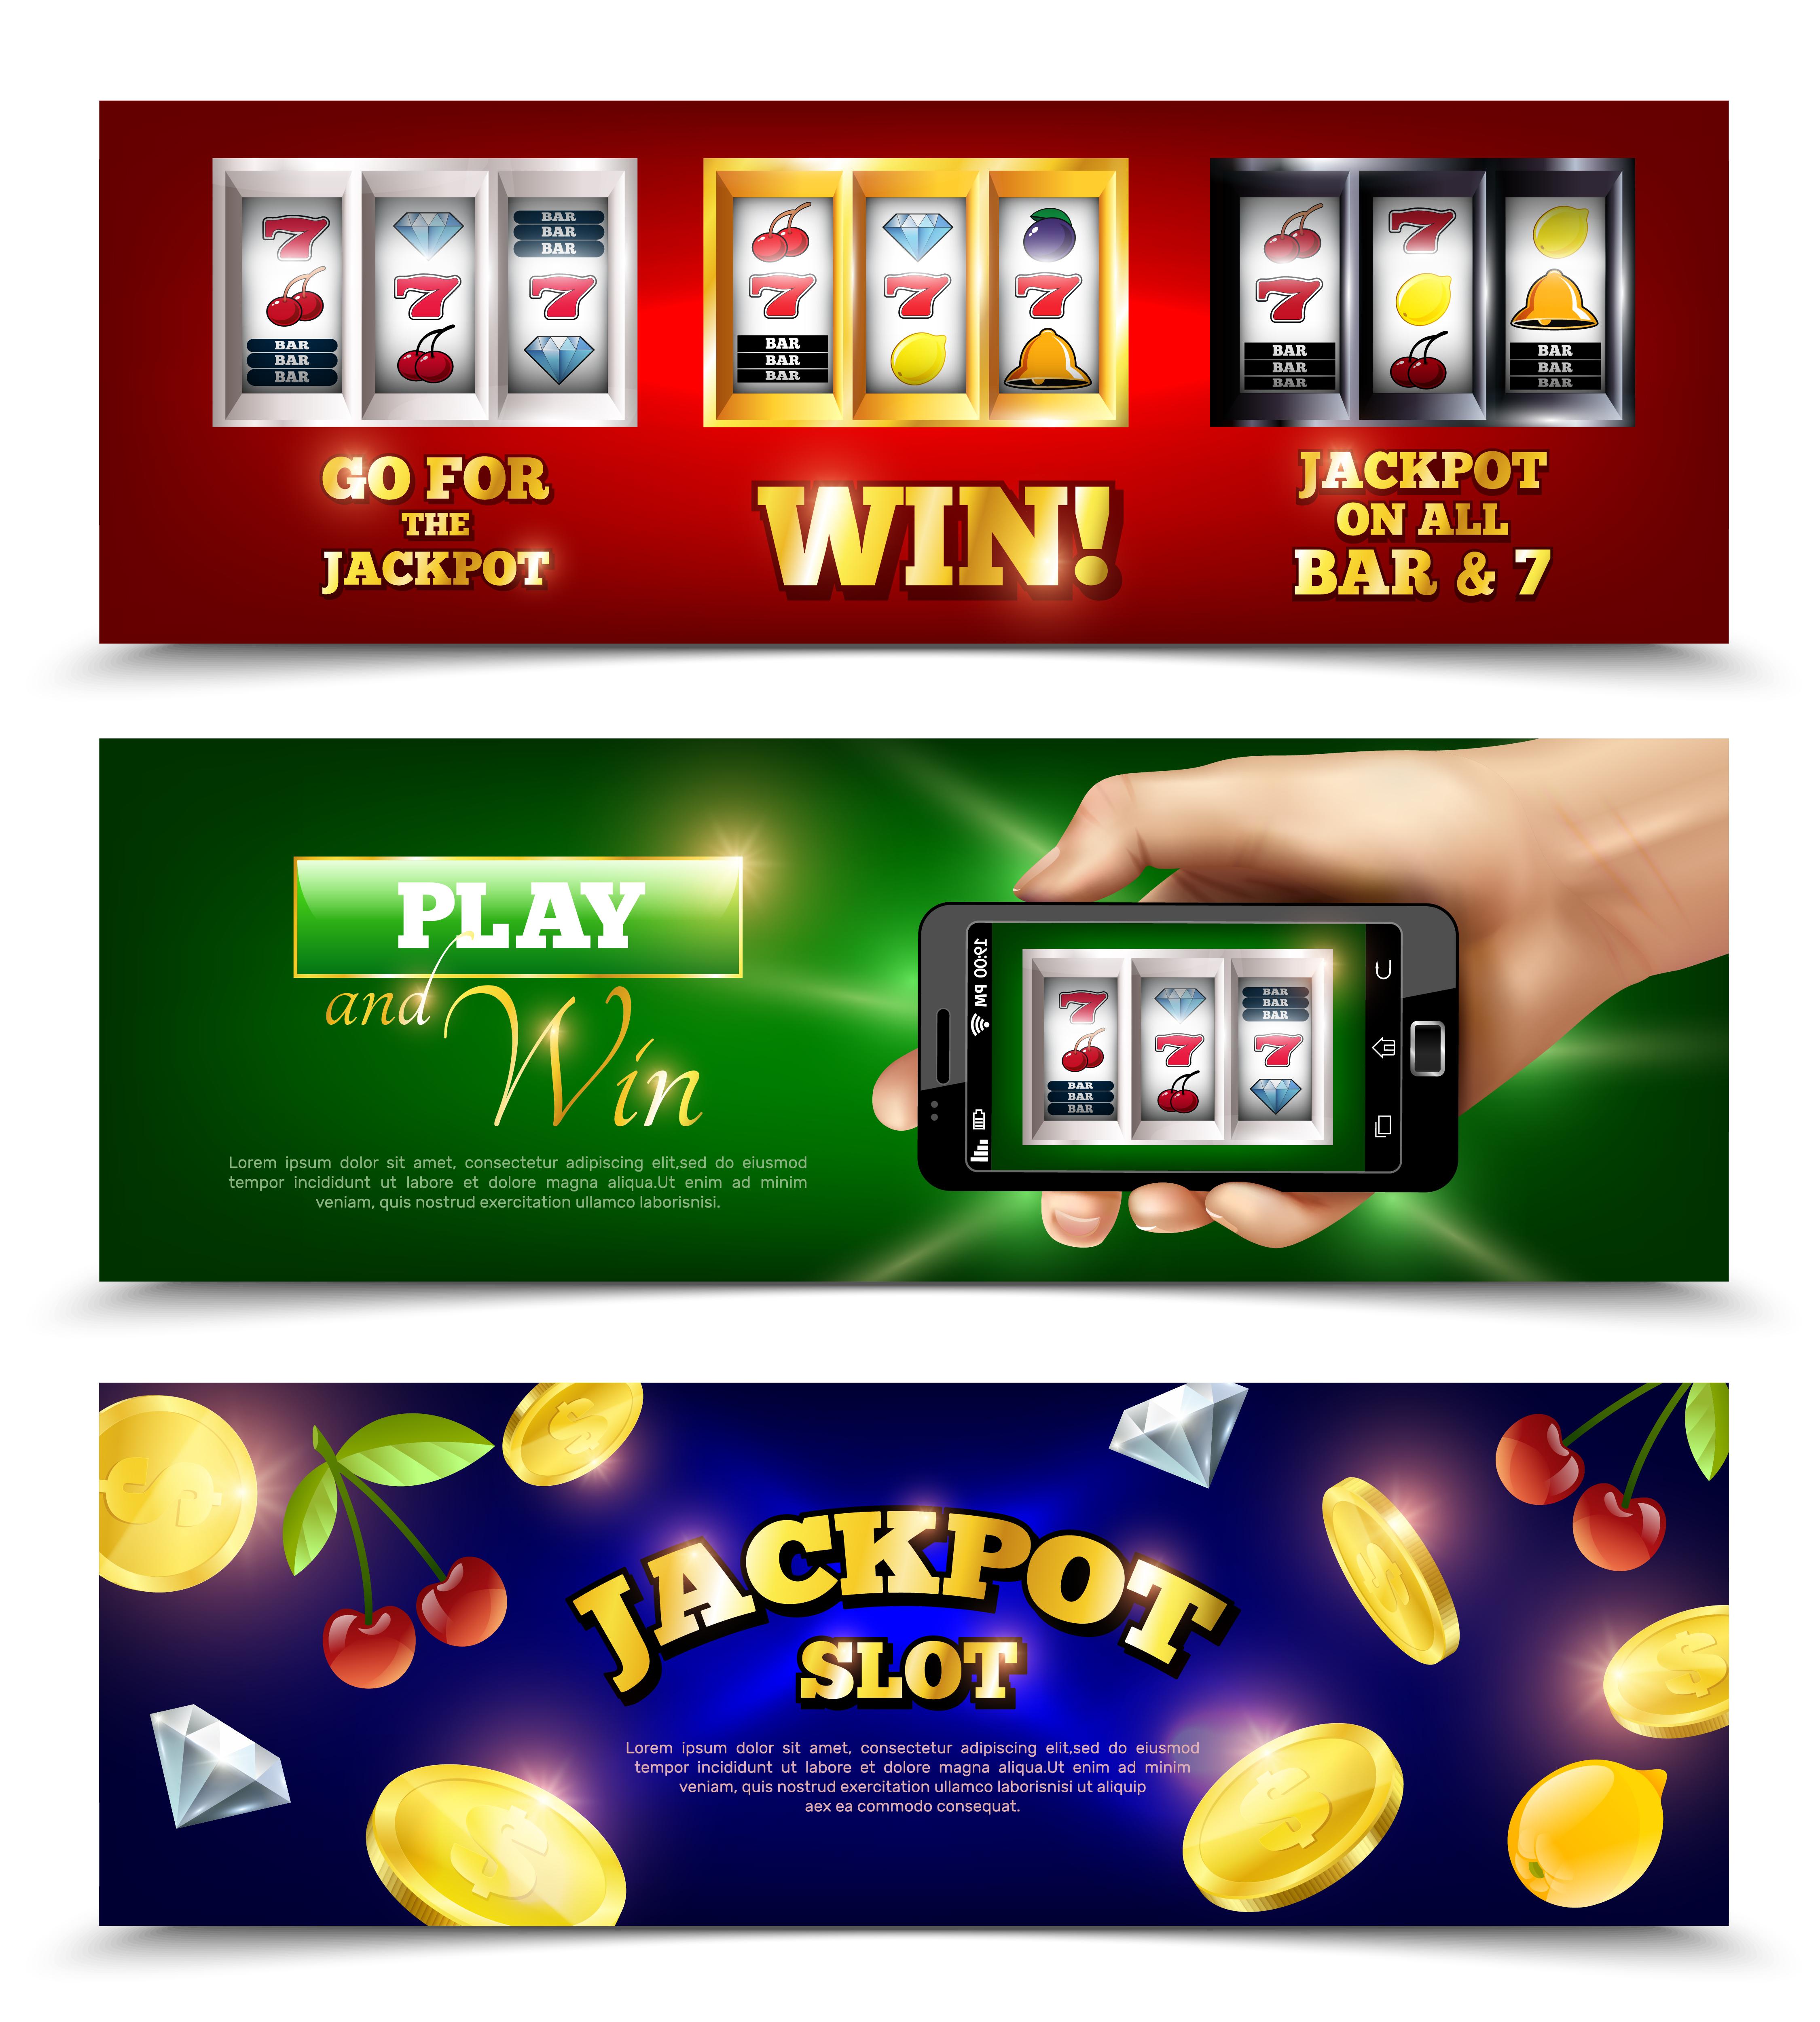 Jackpot Illustrations, Royalty-Free Vector Graphics & Clip Art - iStock